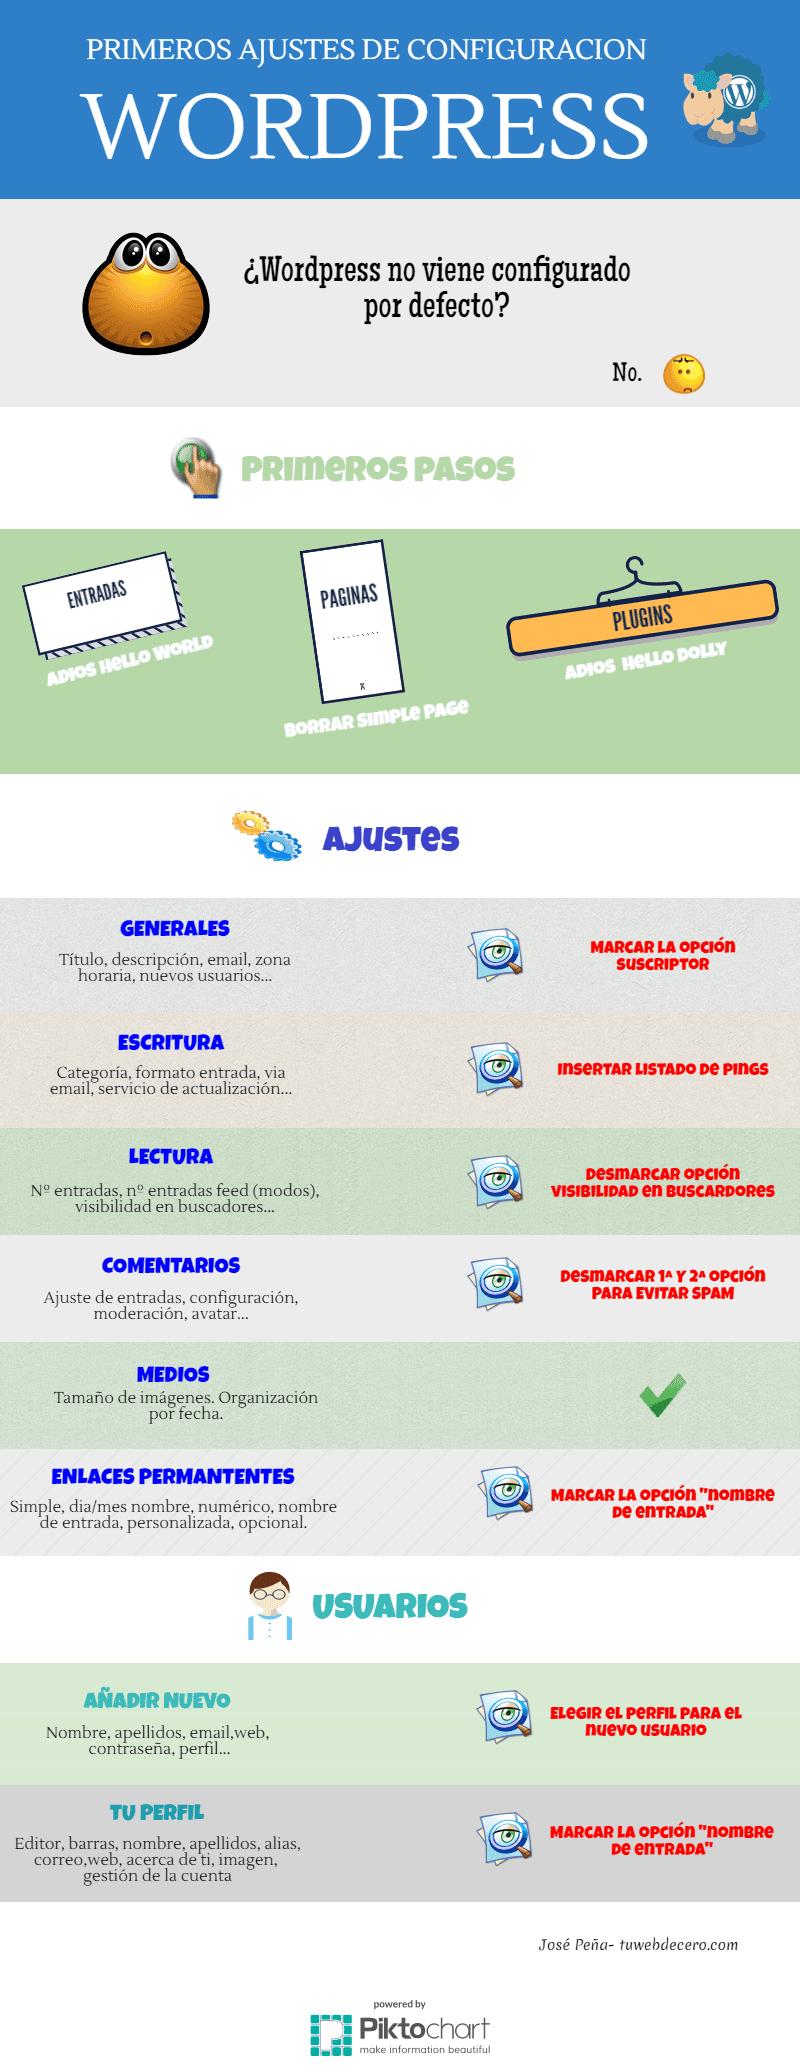 ajustes-para-configurar-wordpress